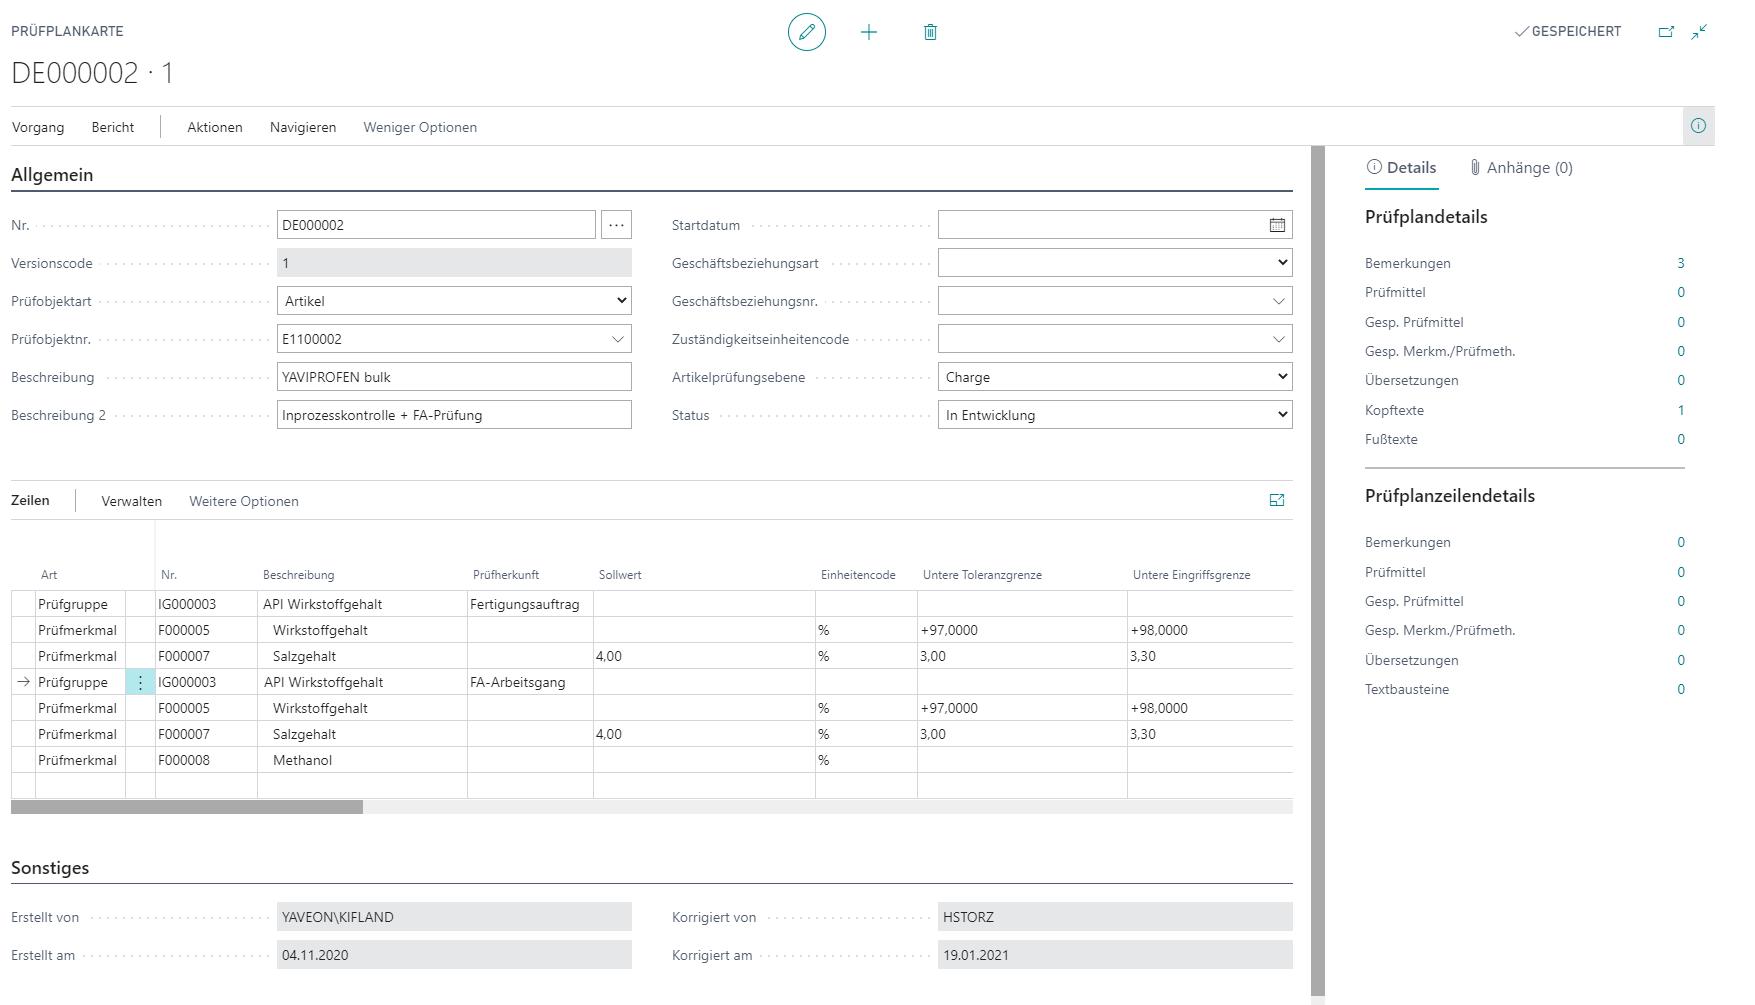 Detailscreenshot Qualitätskontrolle